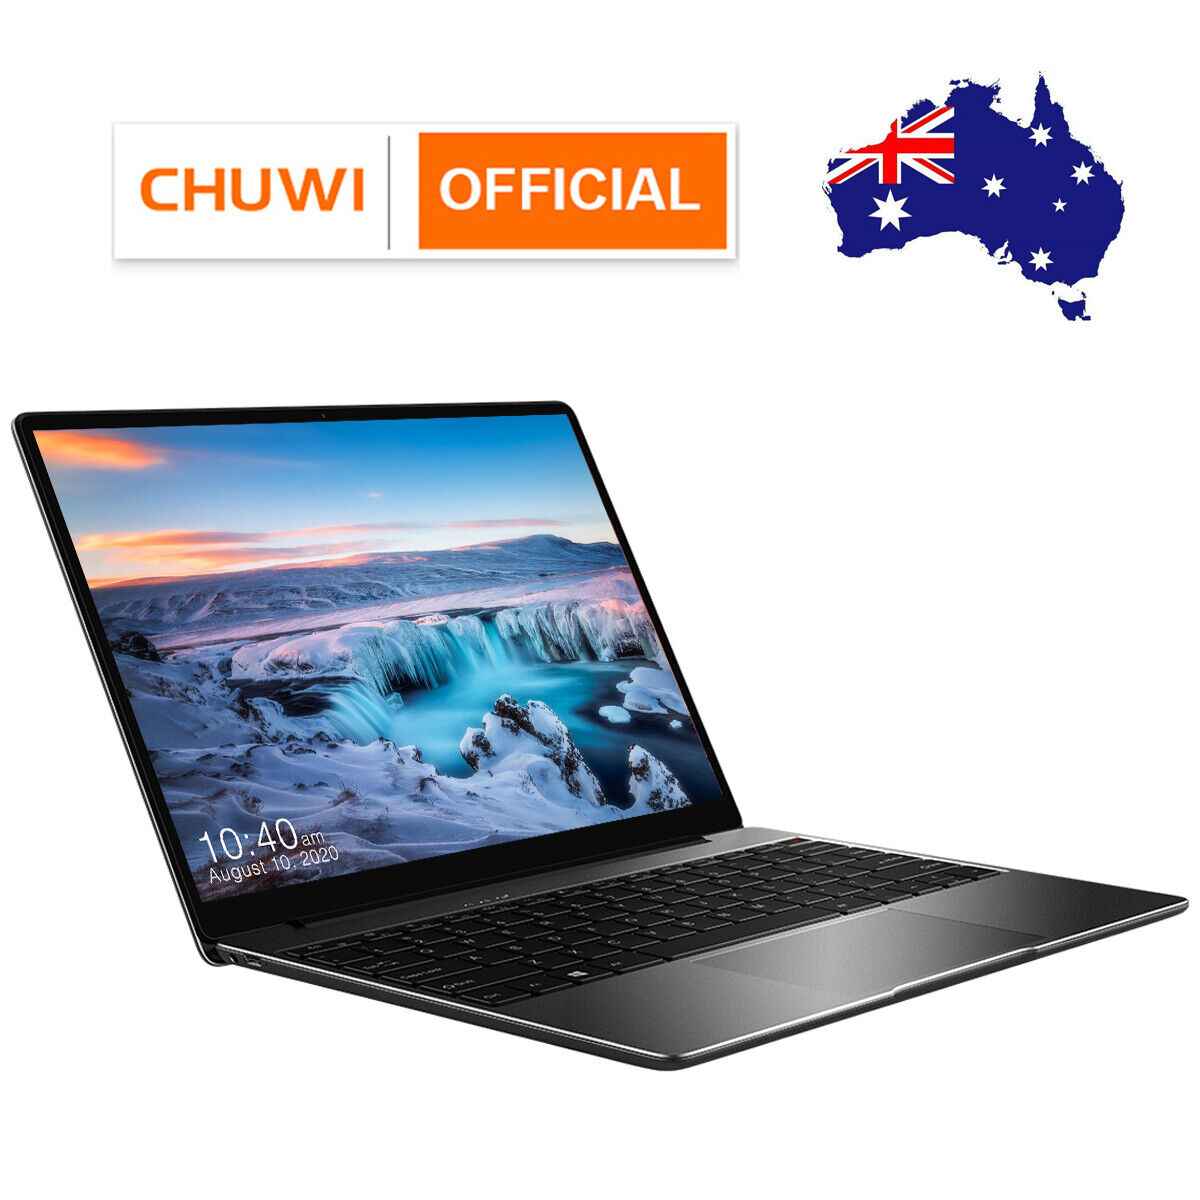 Laptop Windows - CHUWI GemiBook CoreBook HeroBook Pro+/X Laptop Windows10 Intel Core i5 NoteBook